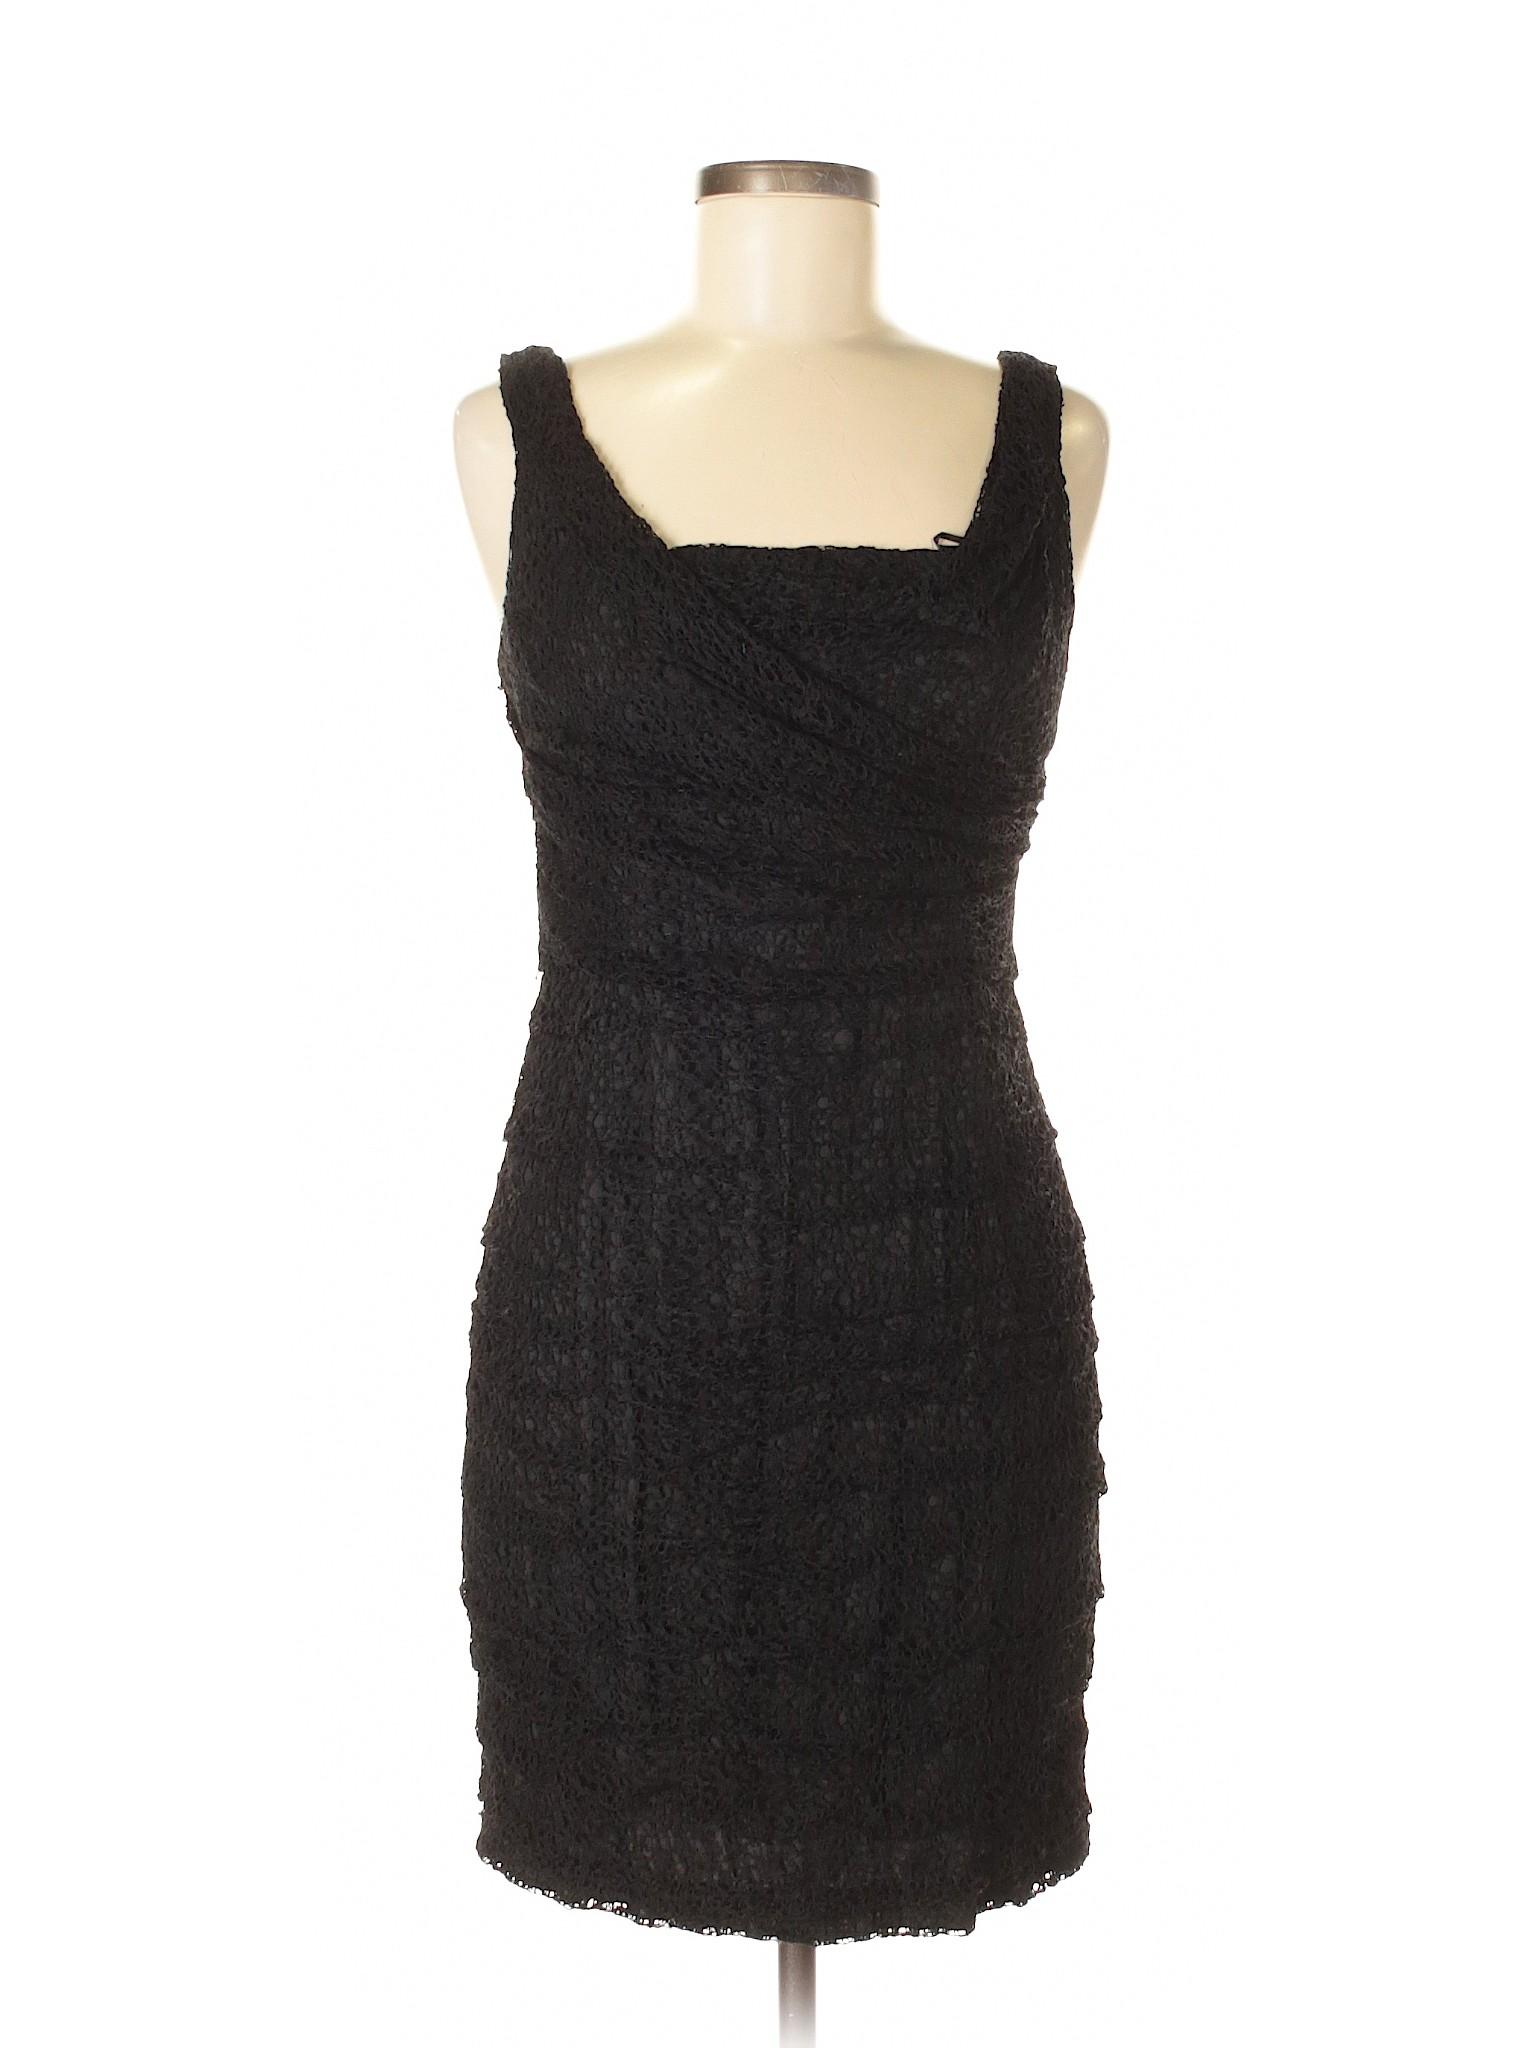 Dress Glory winter Boutique Faded Casual YBwxKgAFIq